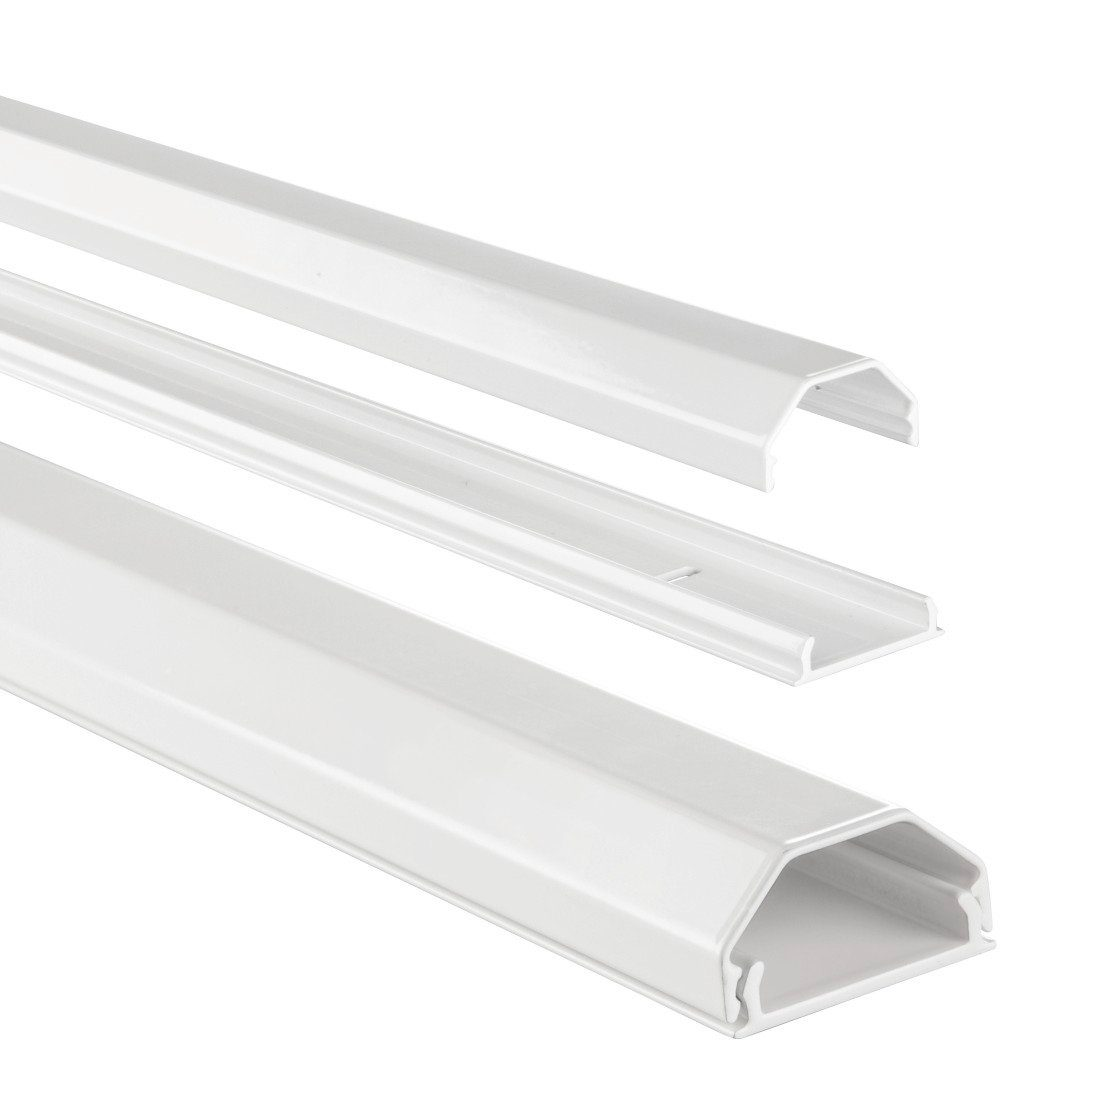 Hama Alu-Kabelkanal, eckig, 110/3,3/1,7 cm, Weiß